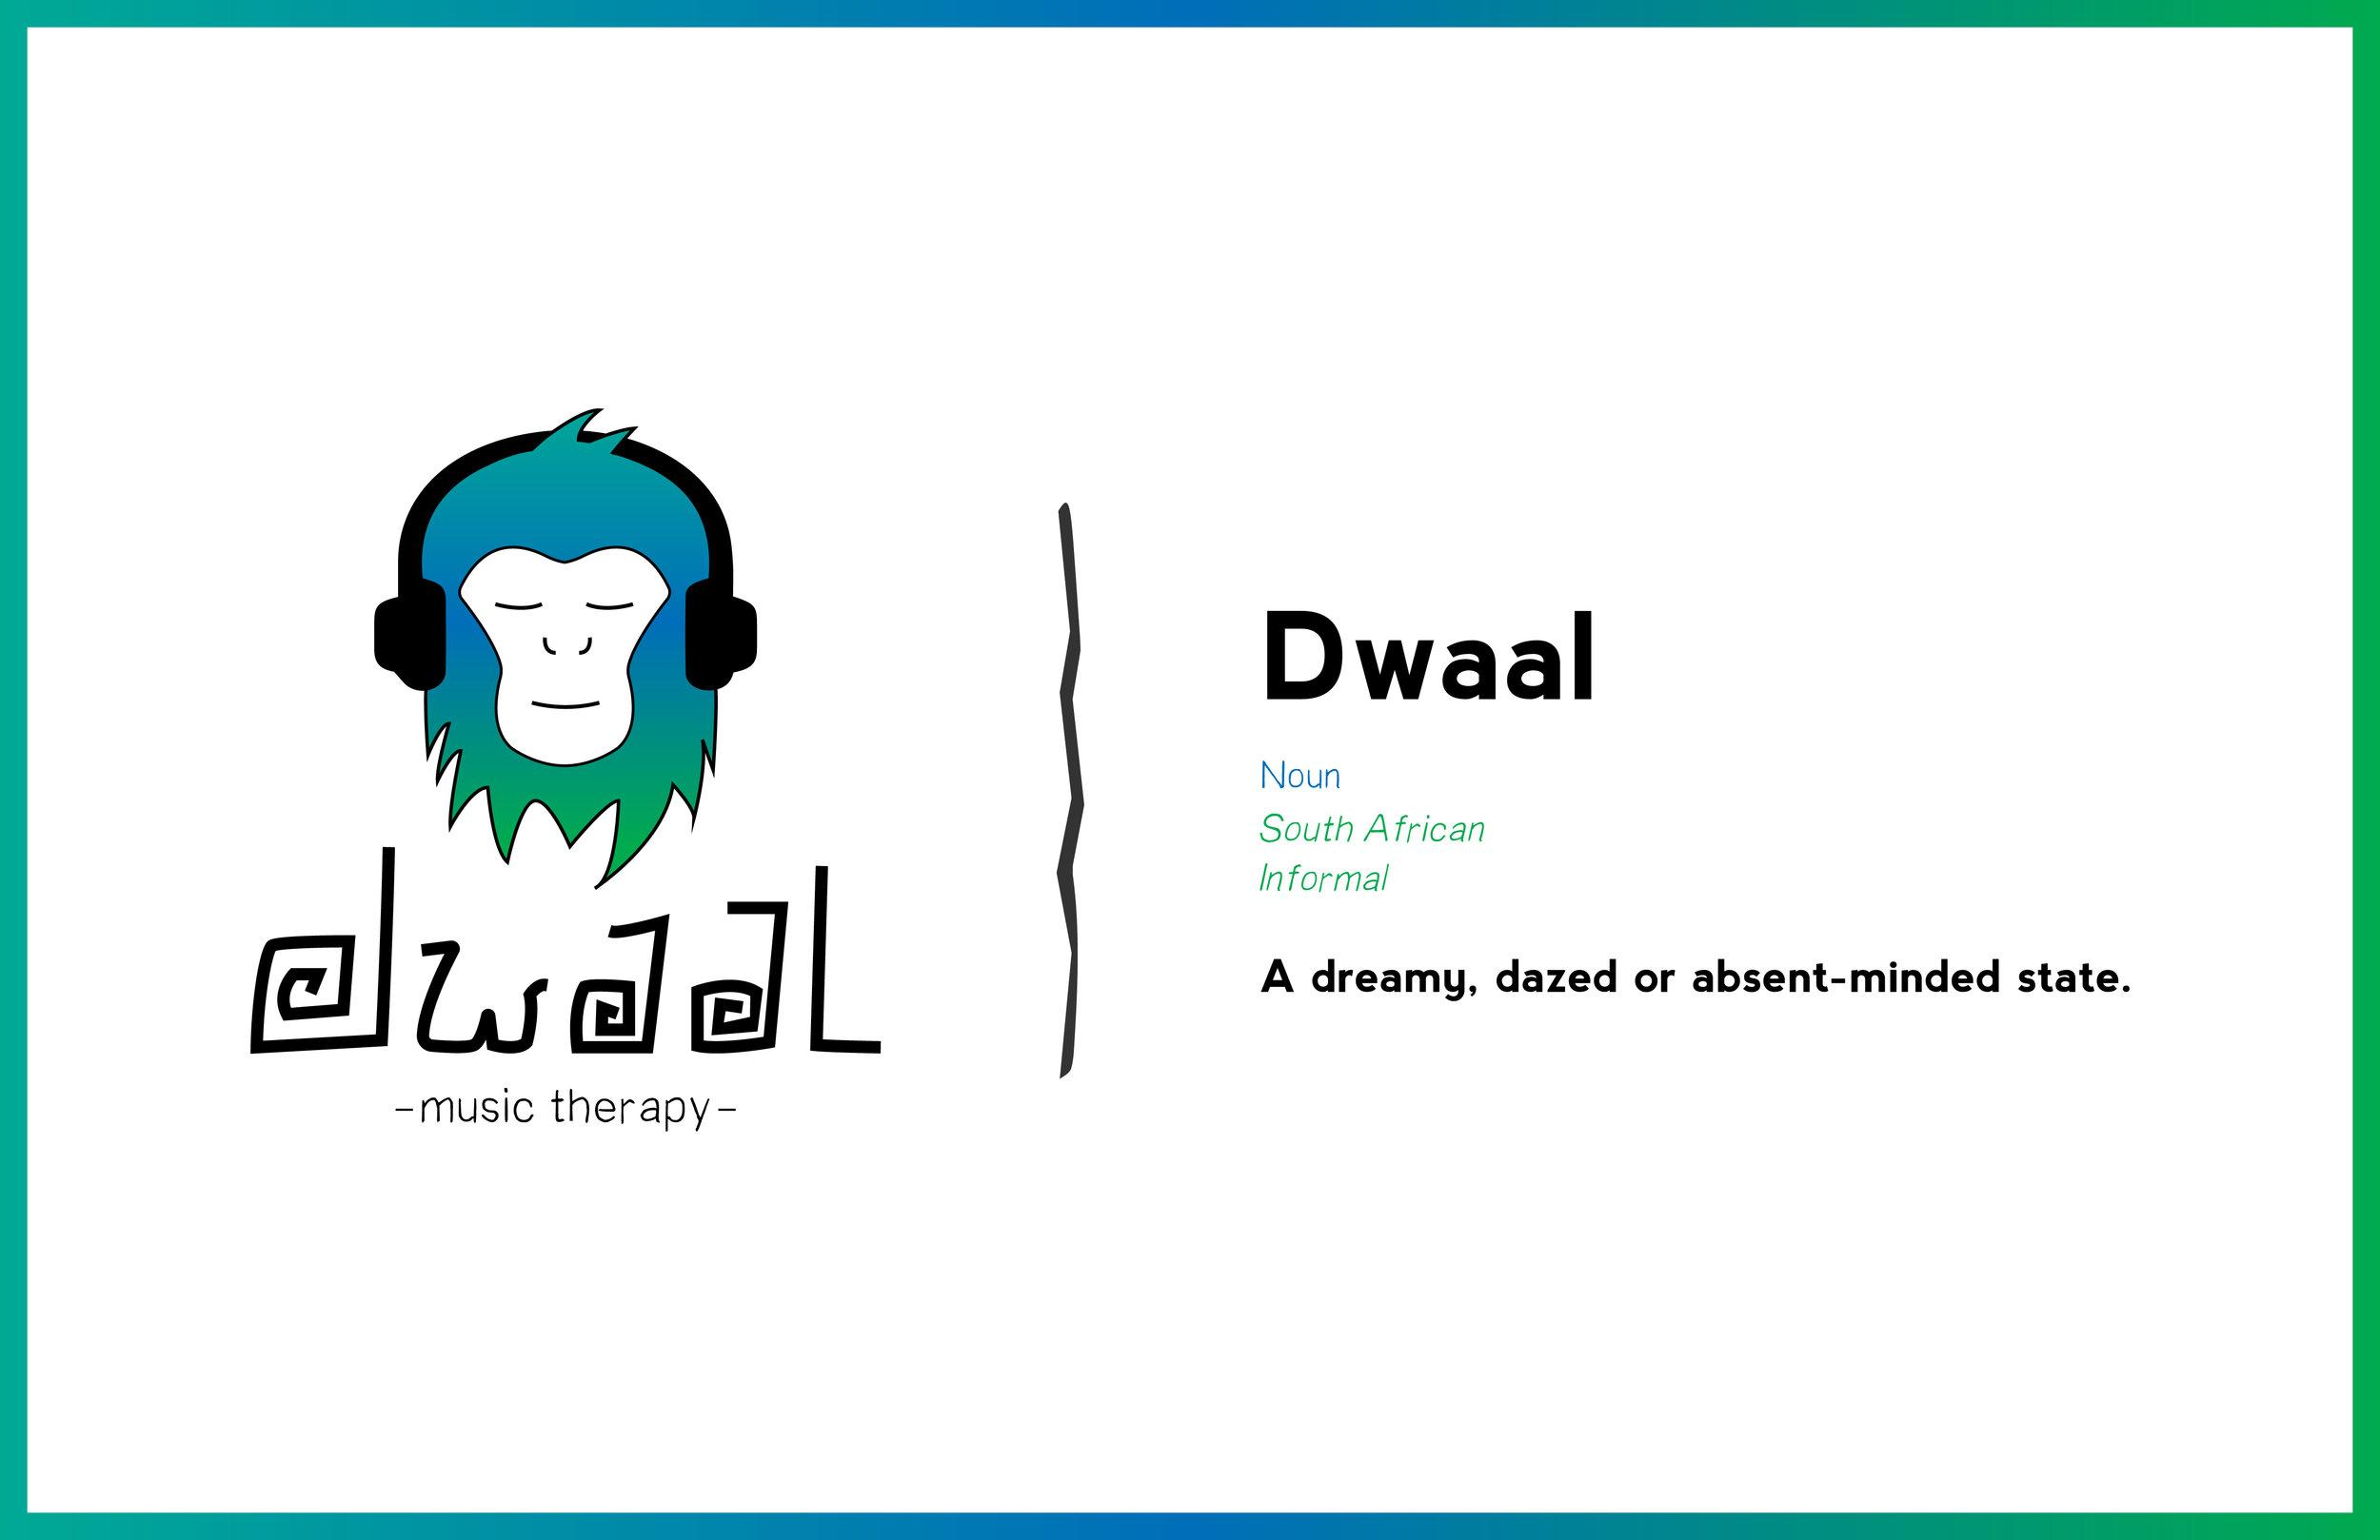 Dwaal 2019 logo and definition-01.jpg